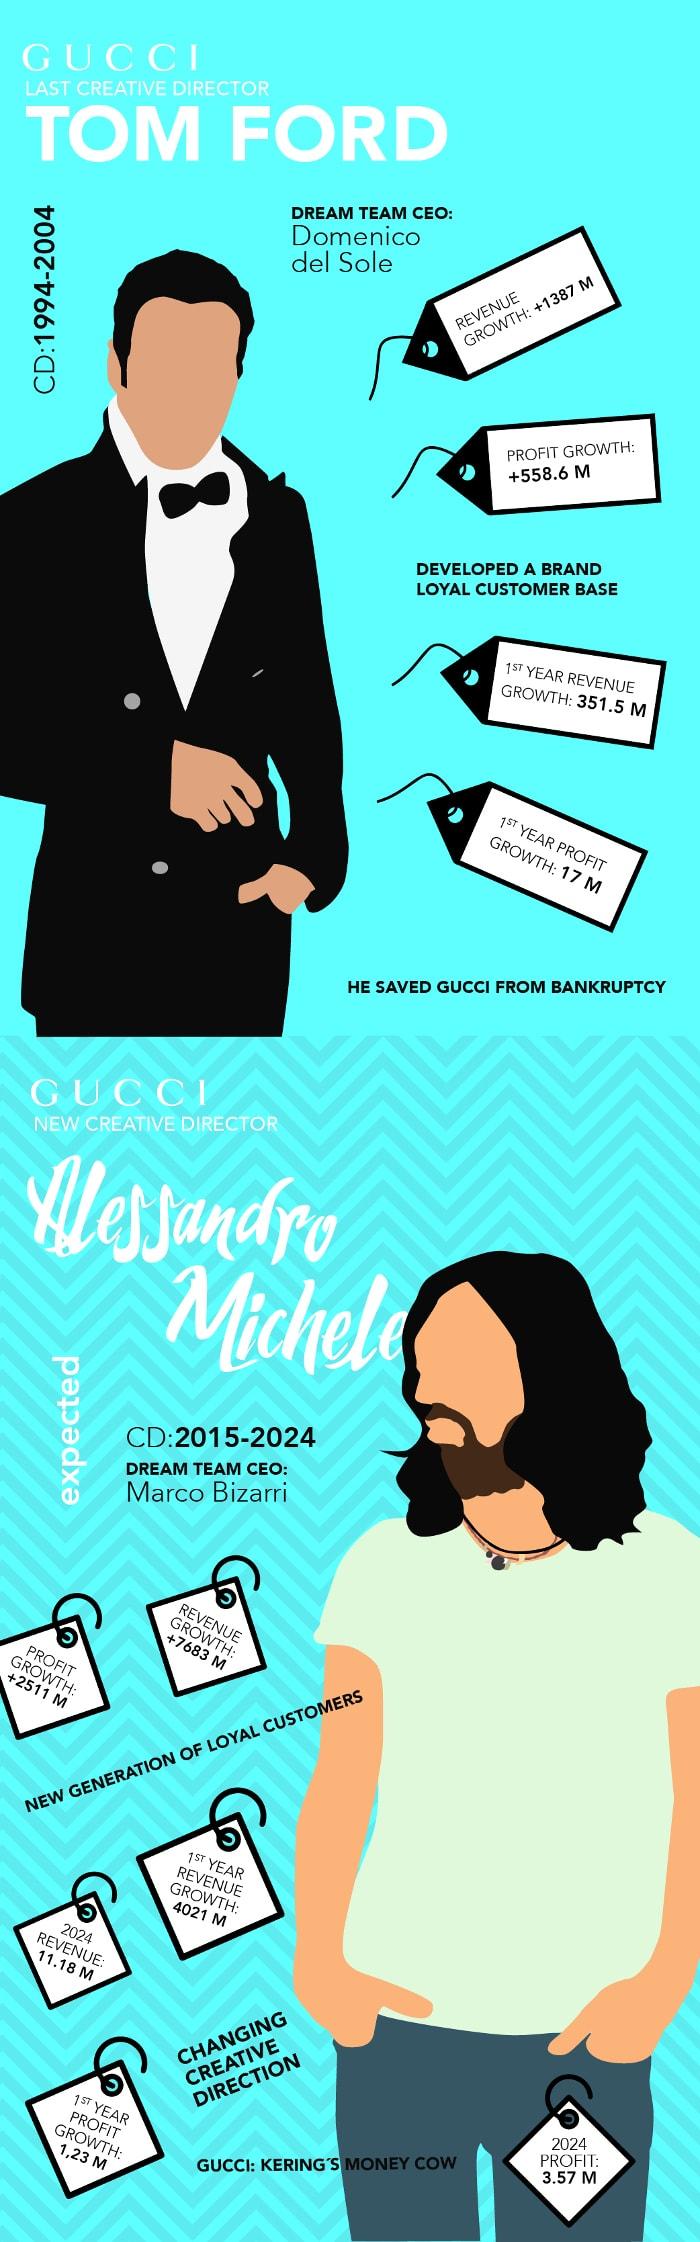 Infographic - Geek-chic versus seksbom: de verschillen tussen Gucci's Alessandro Michele en Tom Ford